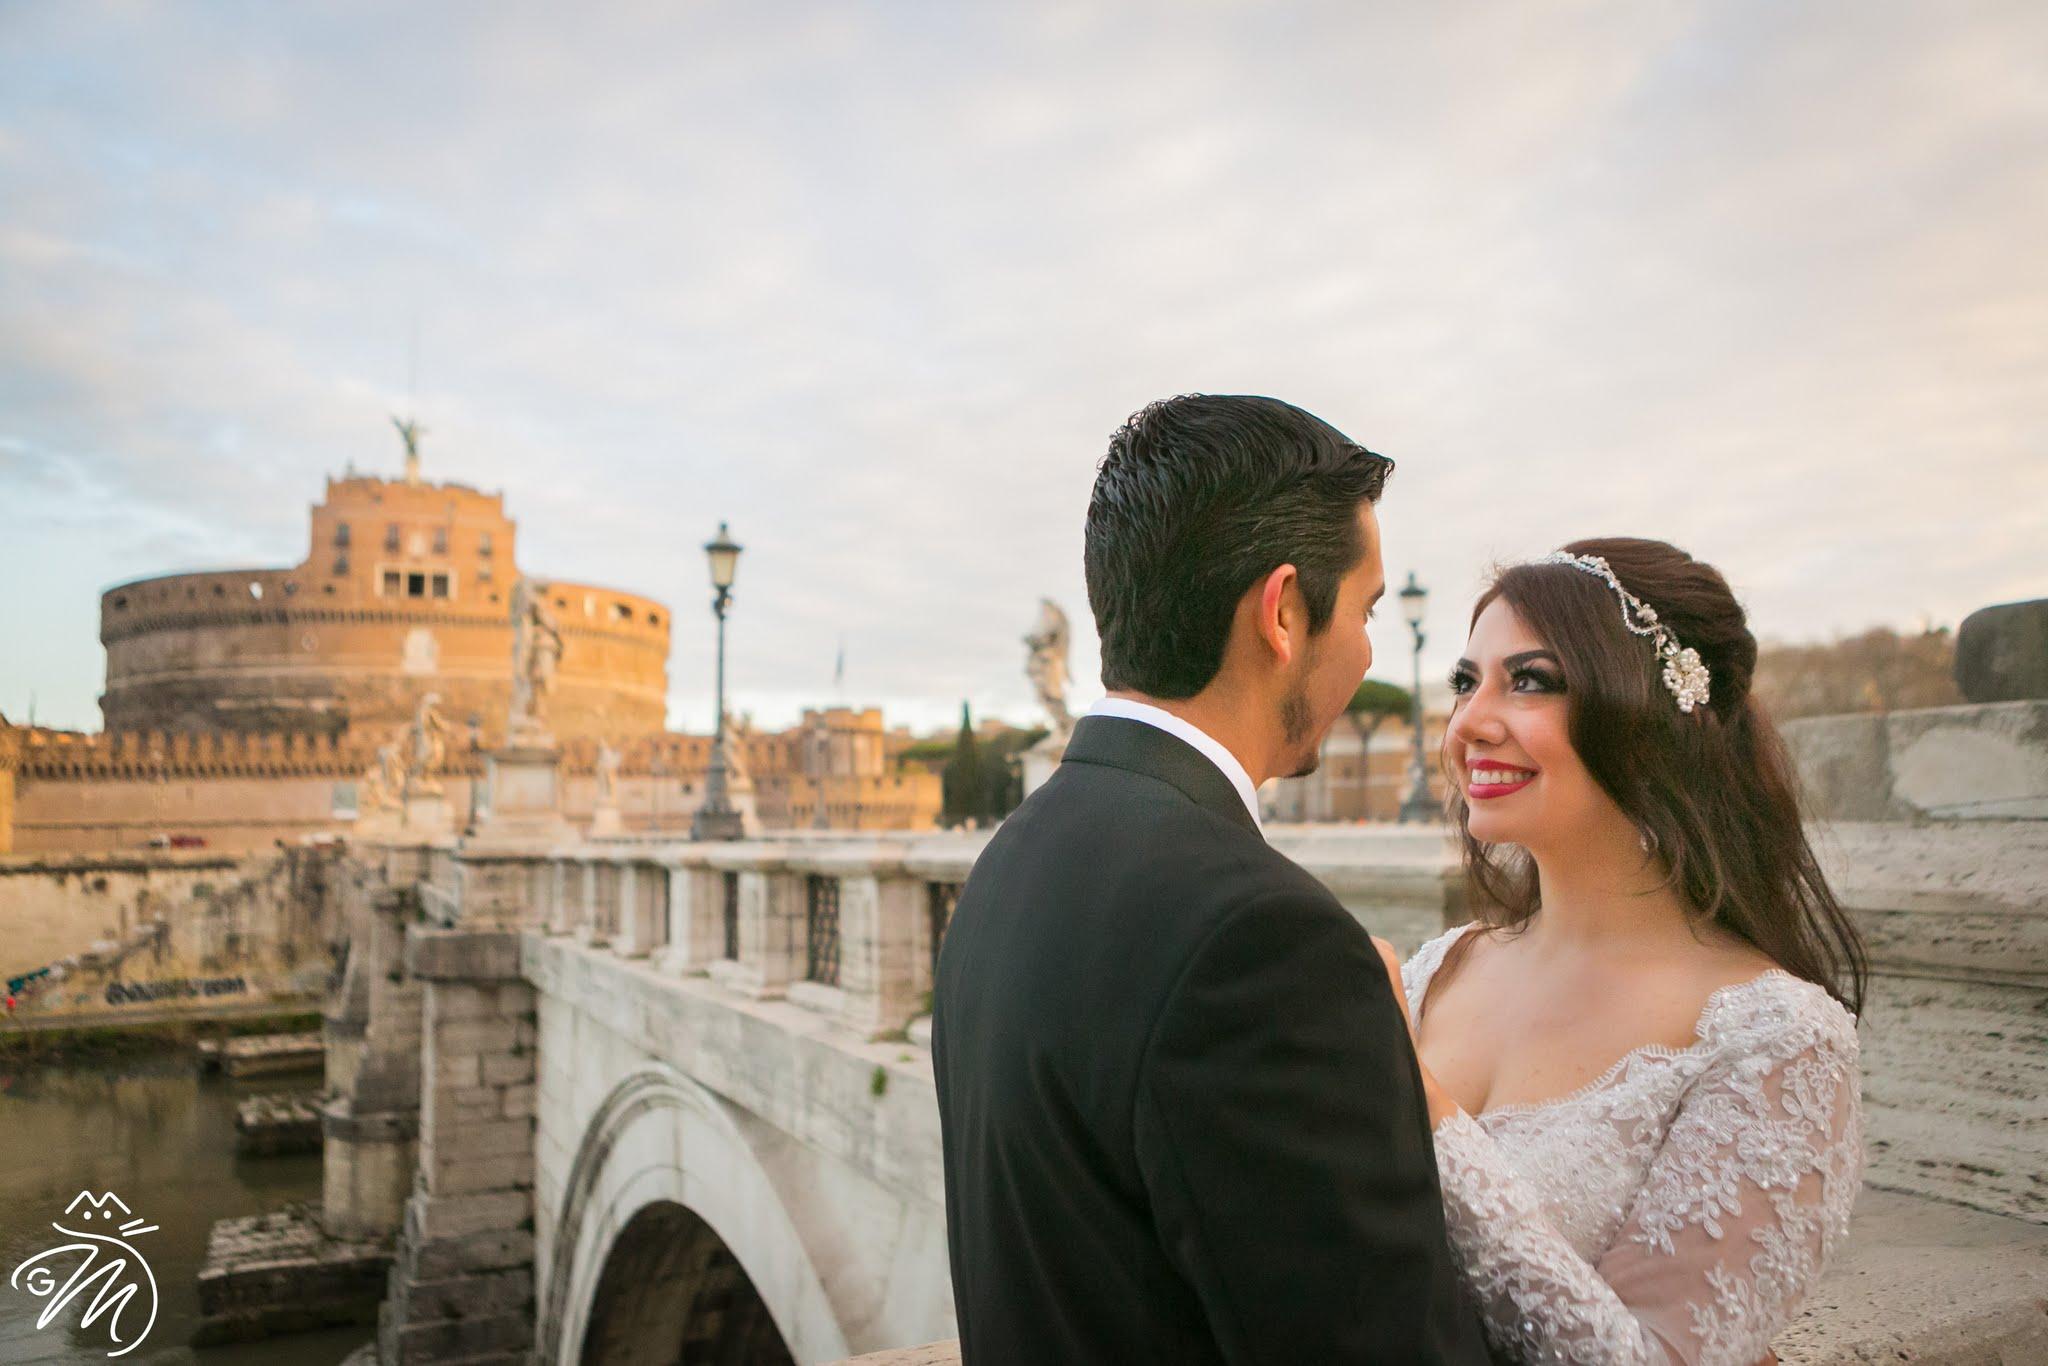 fotografo matrimonio Roma photographer in Italy ORIZZONTALI2_LOGO_HOME_PAGE_INTERNATIONAL_PHOTOGRAPHER_IN_ROME_WEDDING_DESTINATION_GIROLAMO_MONTELEONE_-15